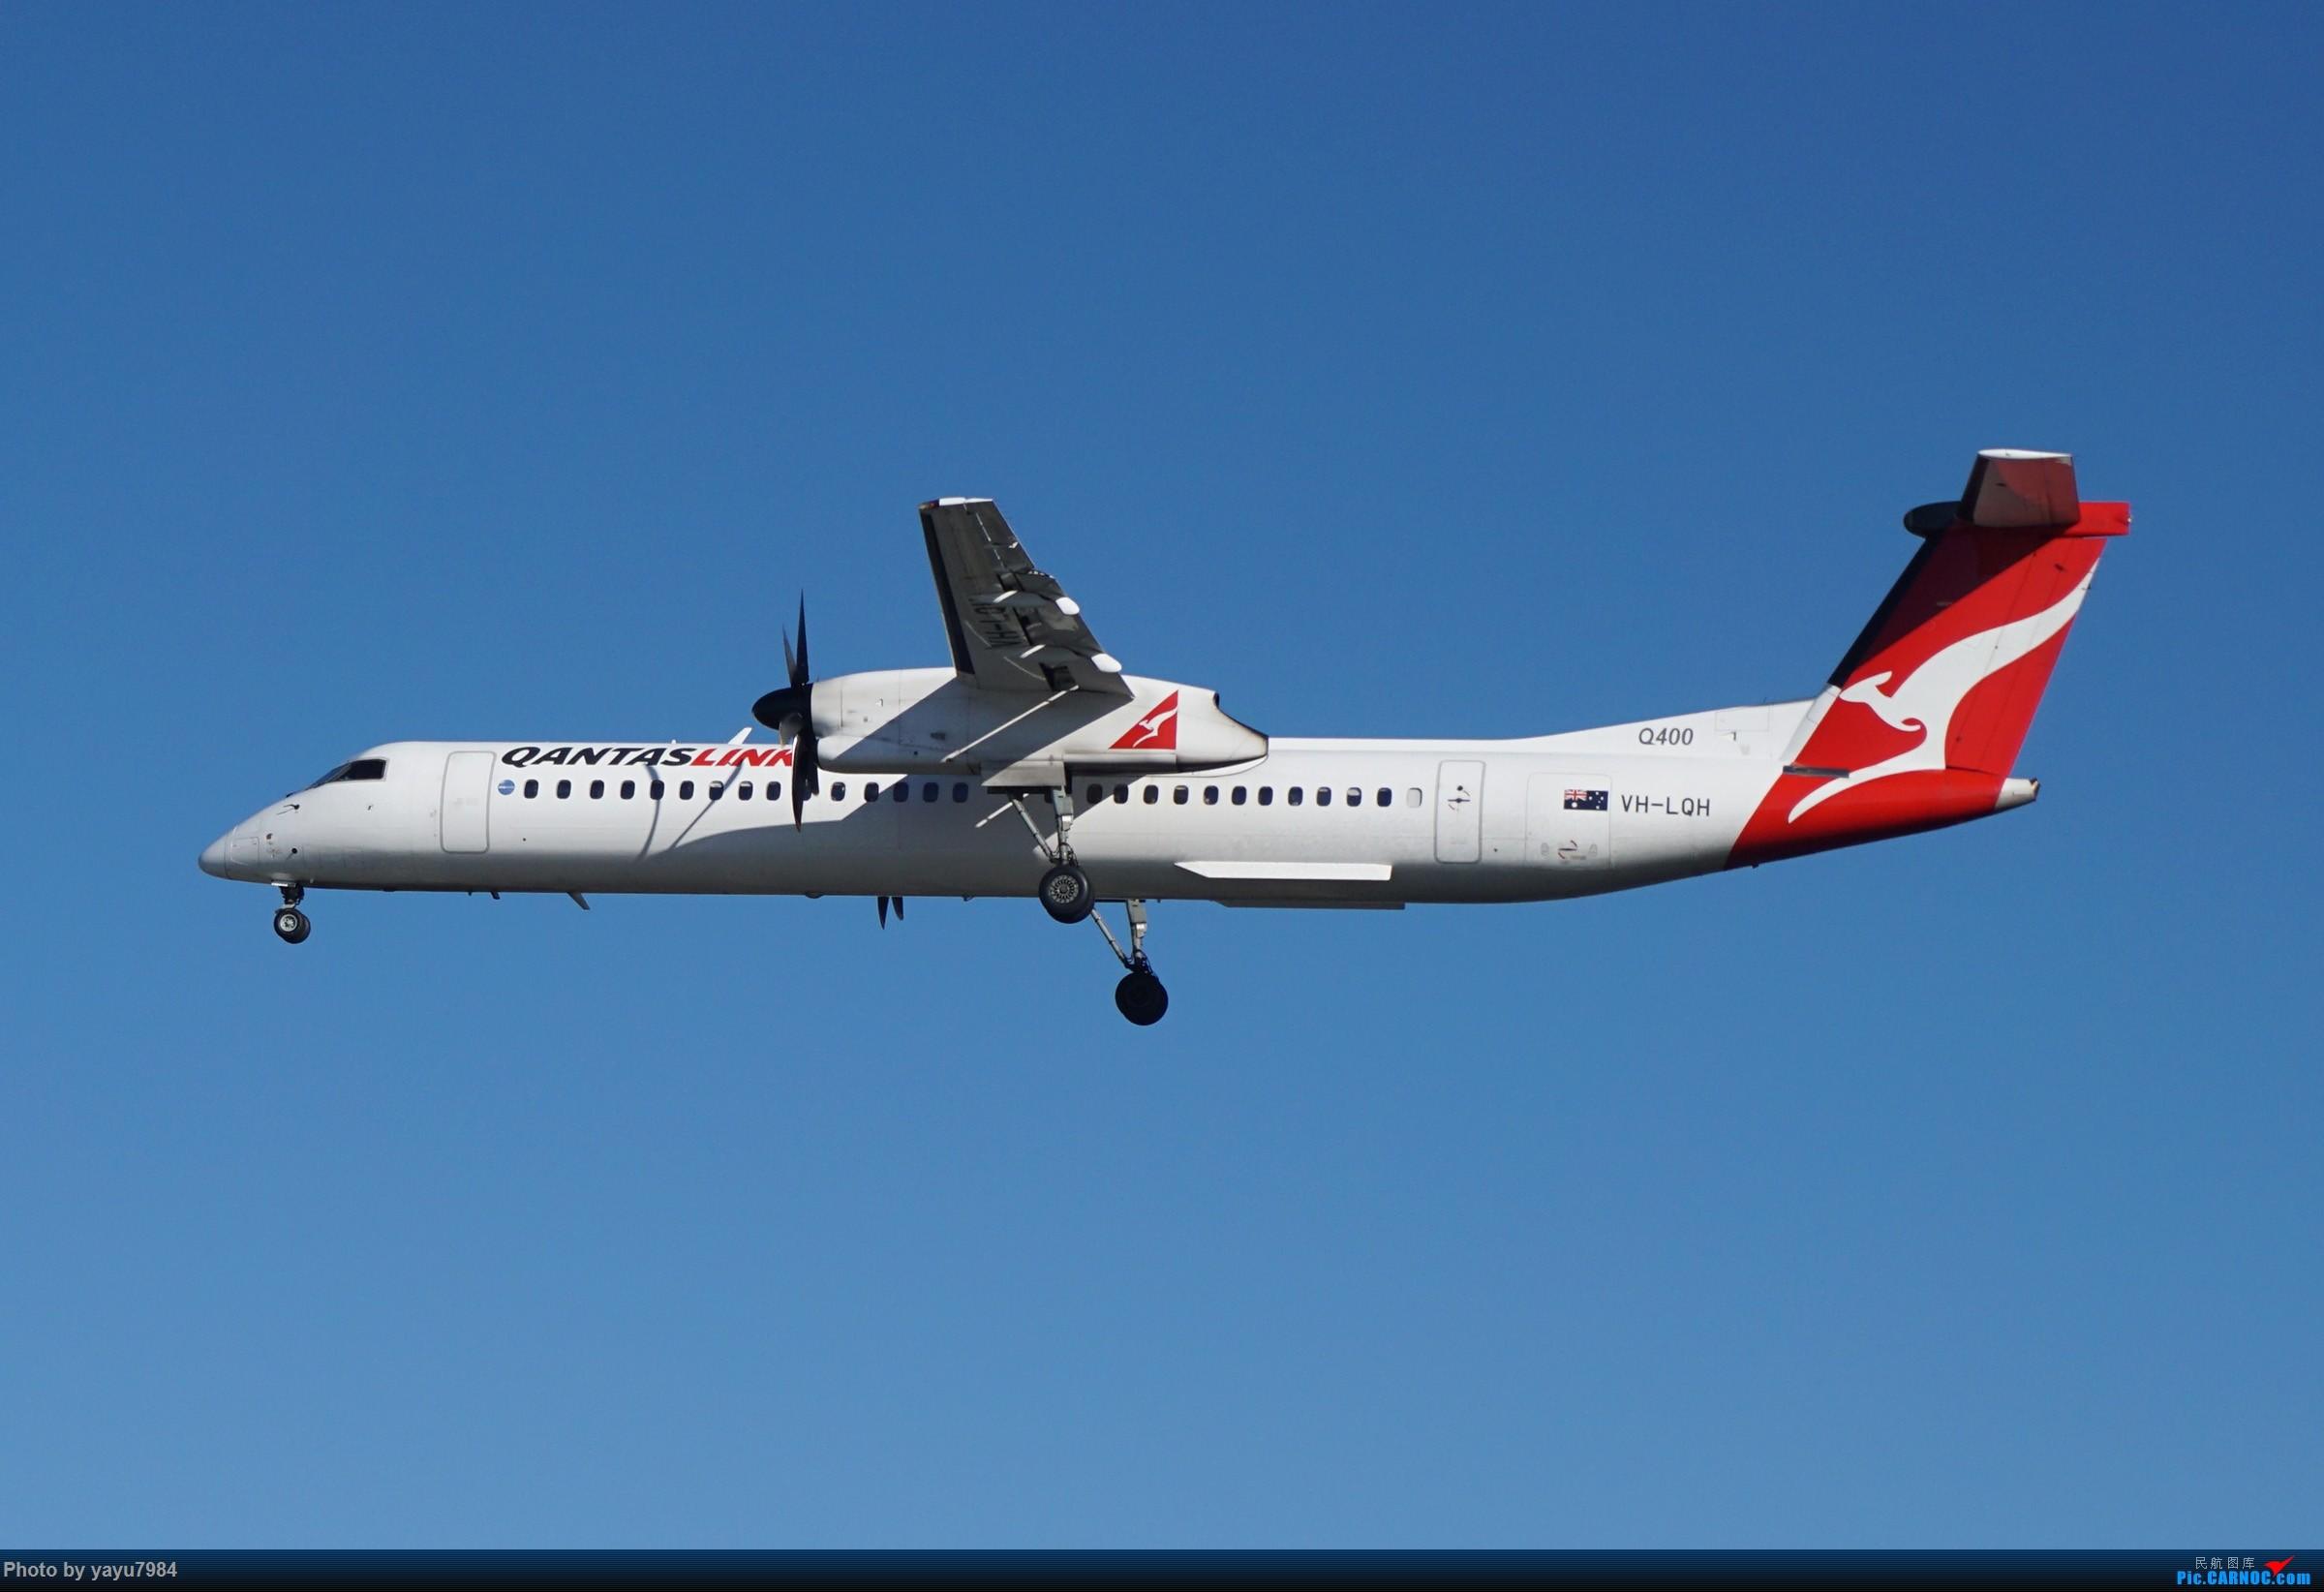 Re:[原创][SYD] 晨悉尼,16R扎堆到达 DE HAVILLAN CANADA DHC-8-400 VH-LQH 澳大利亚悉尼金斯福德·史密斯机场